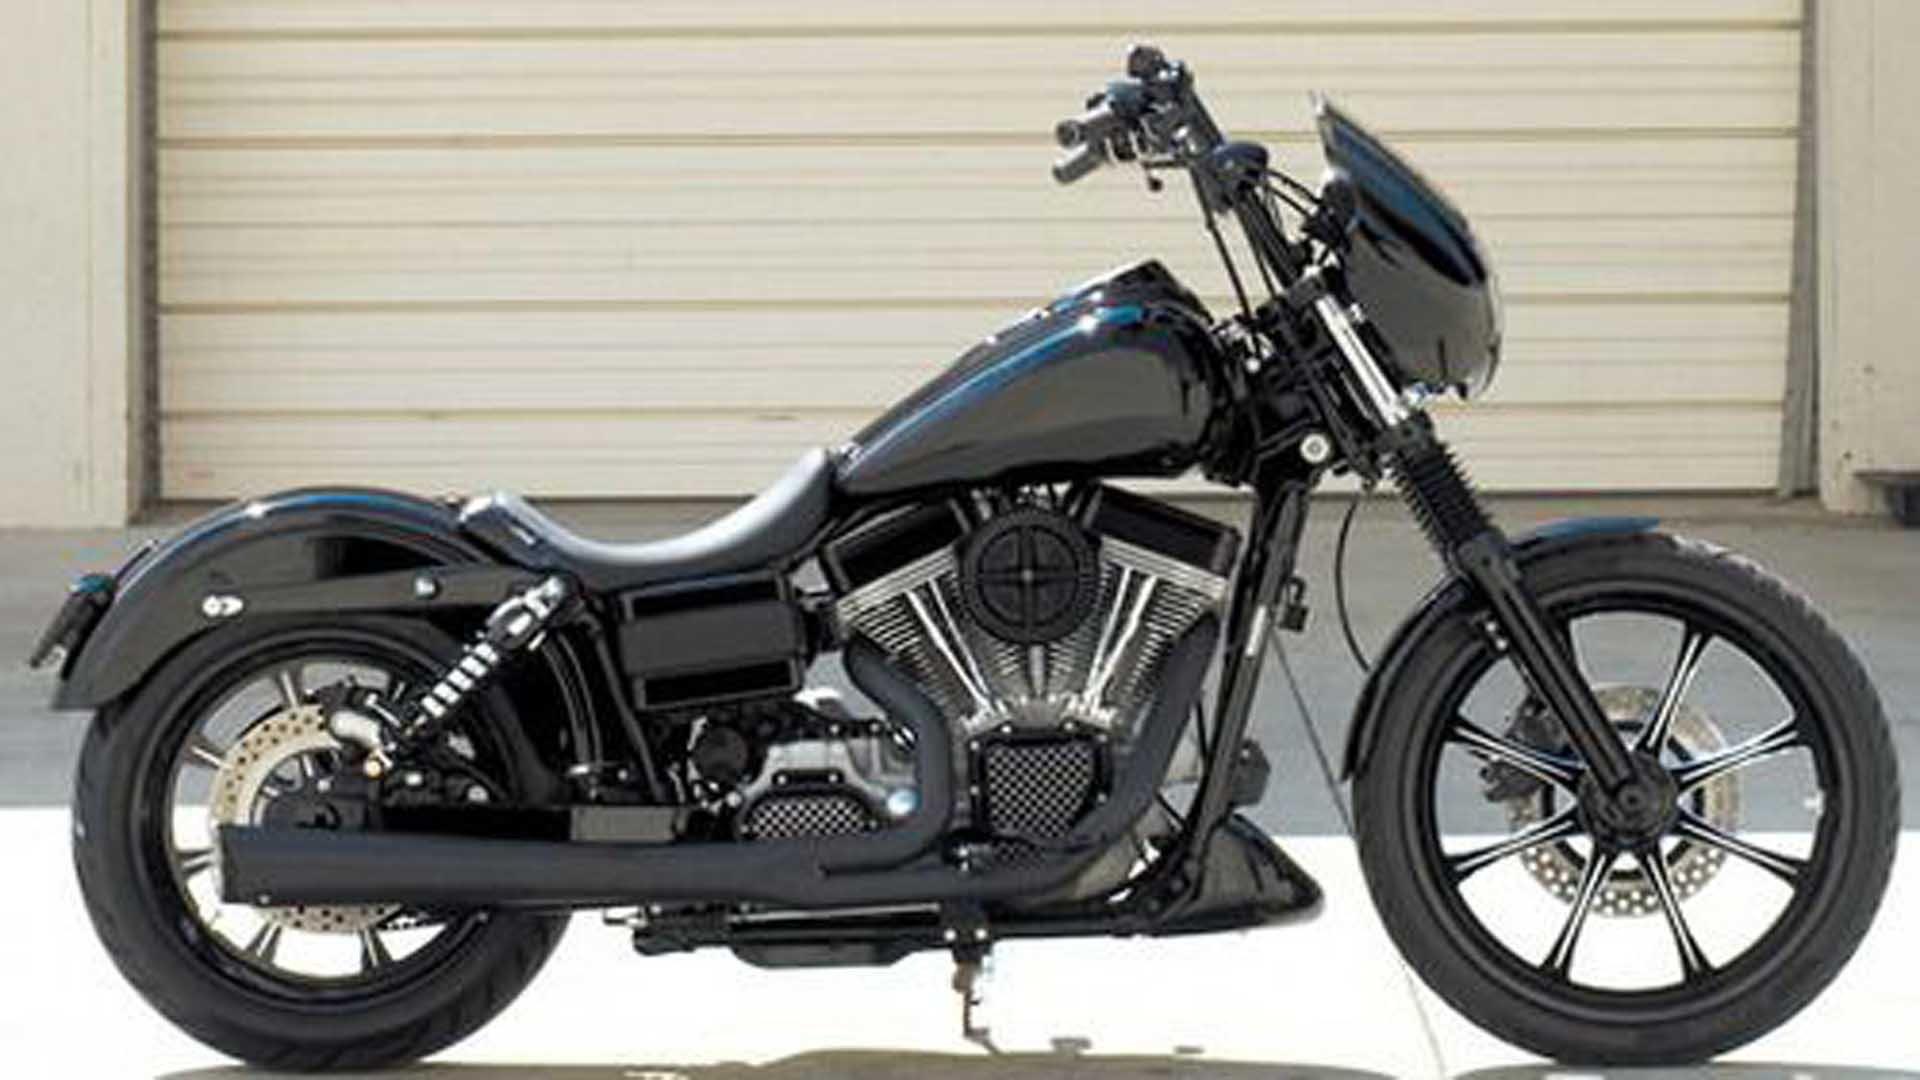 Harley Davidson Dyna Glide Buying Guide Hdforums